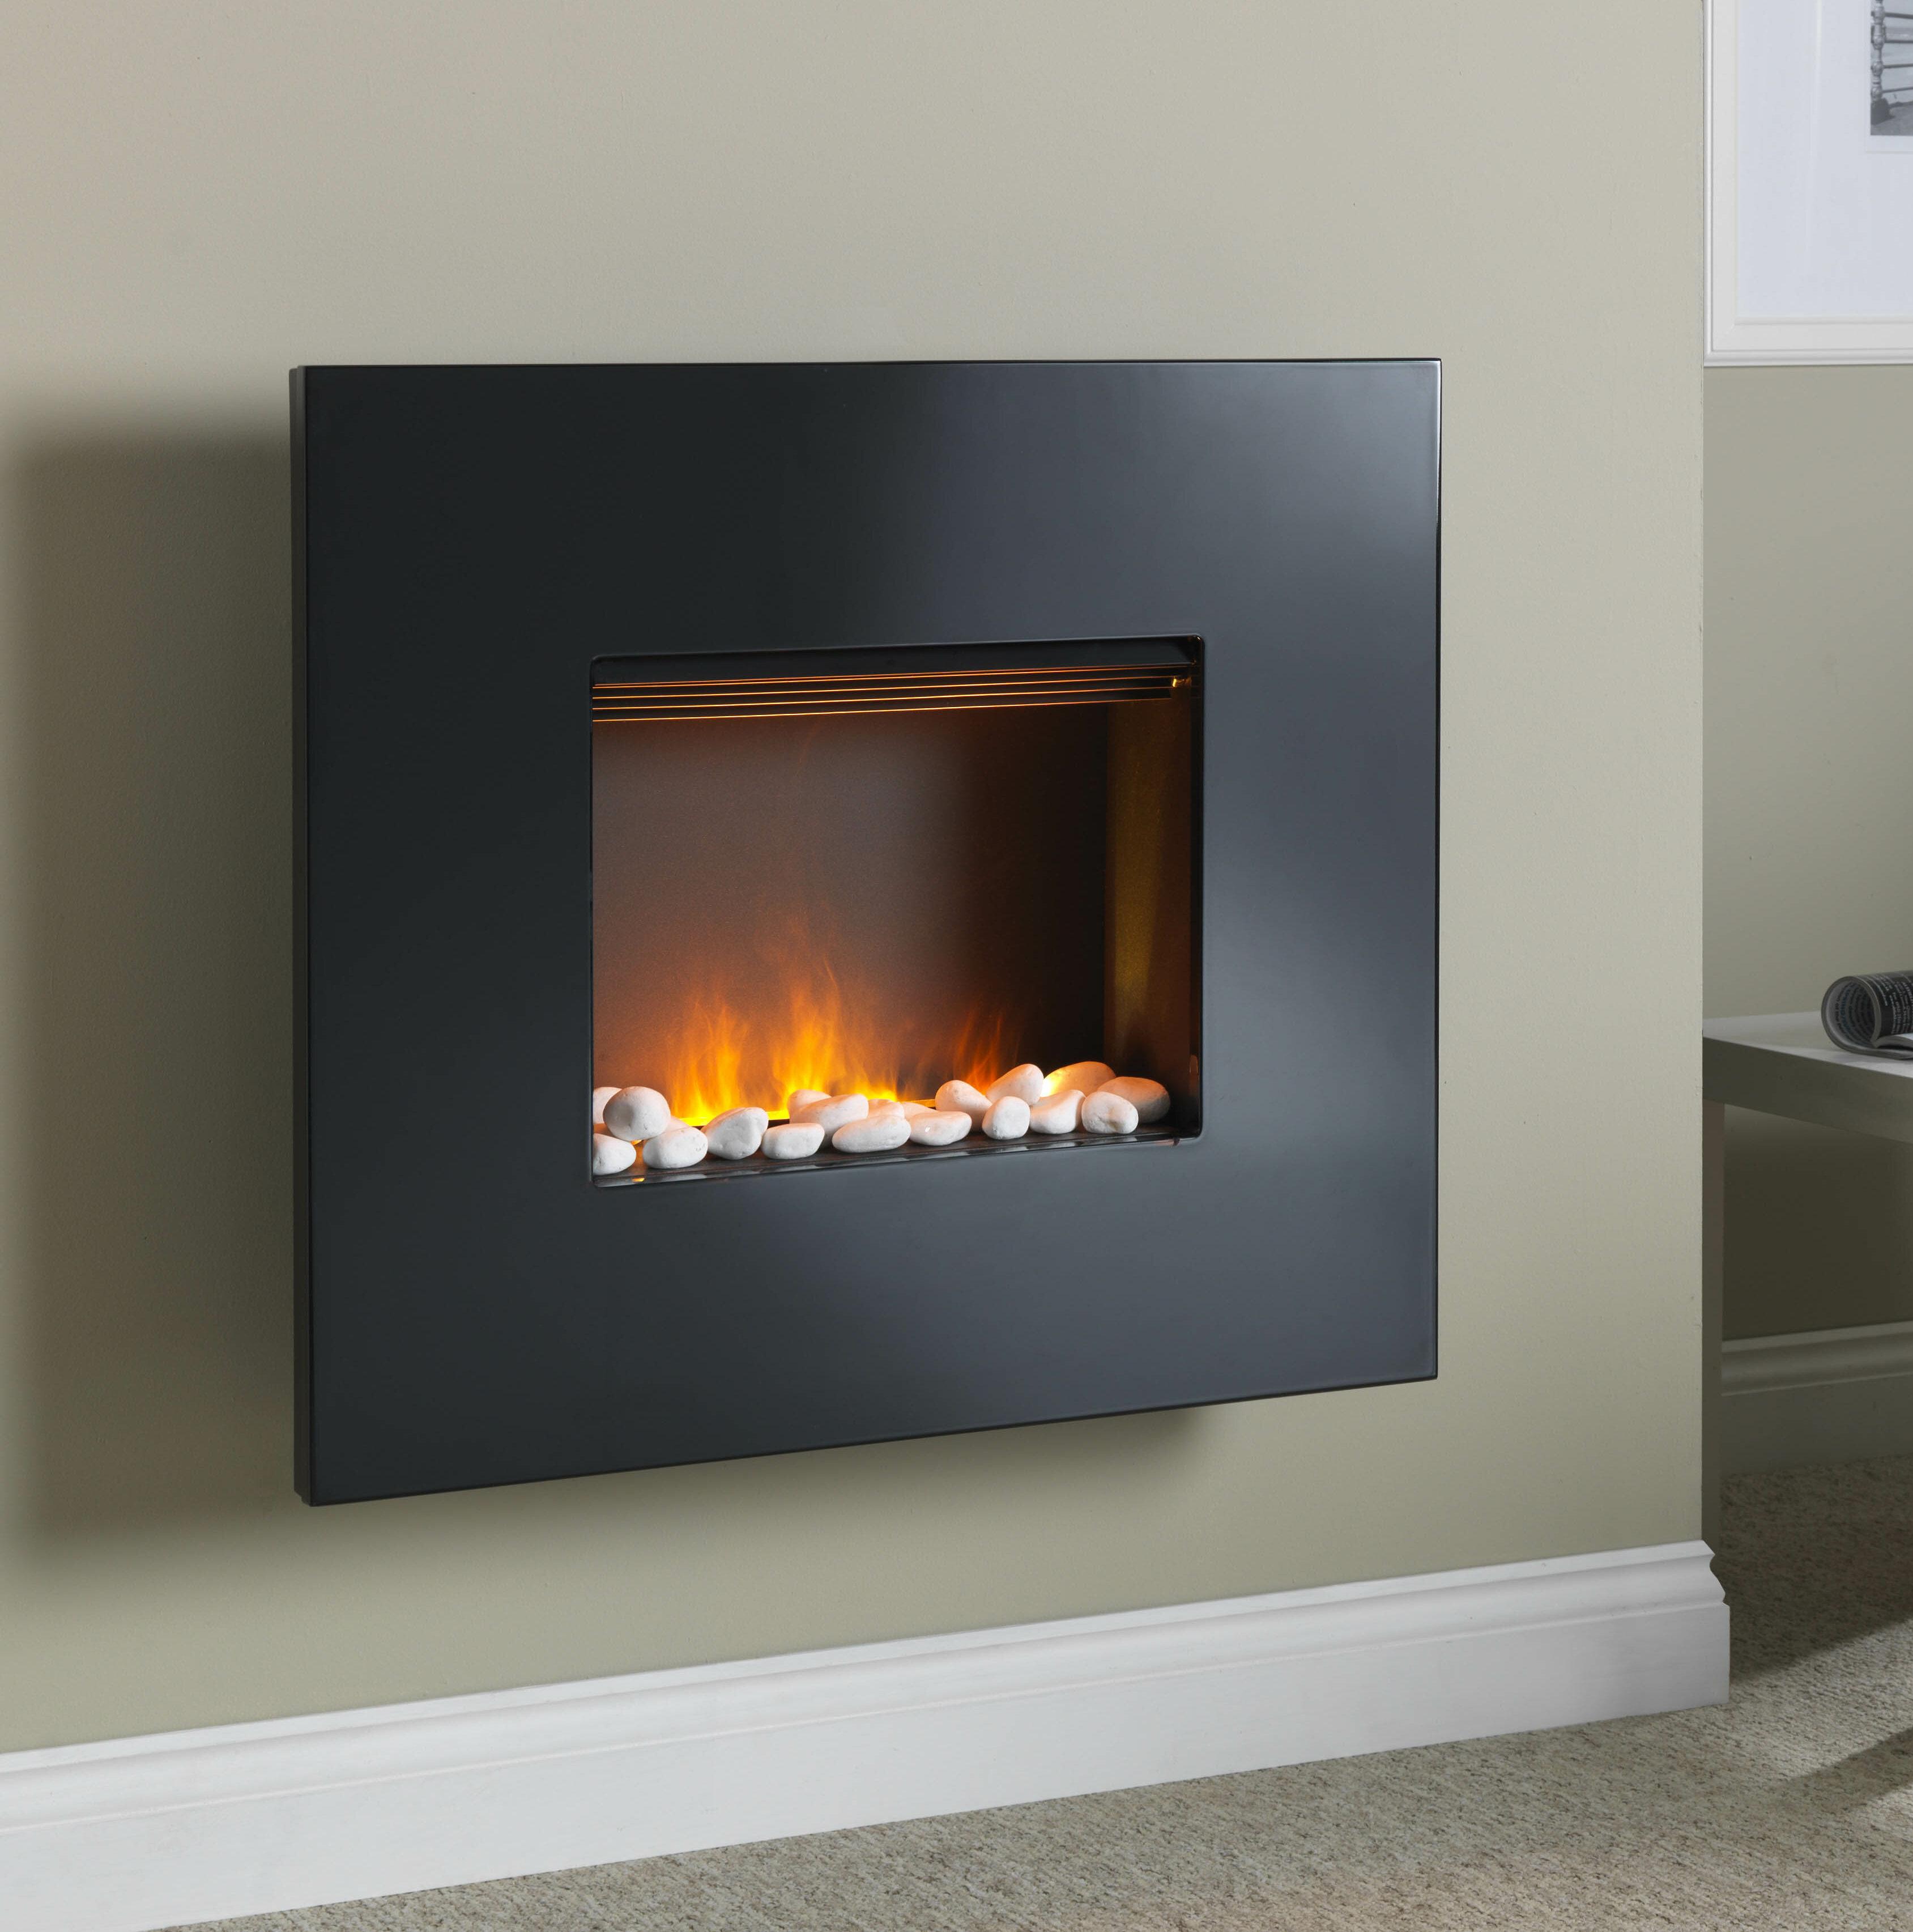 Stupendous Pemberley Optimyst Electric Fireplace Download Free Architecture Designs Salvmadebymaigaardcom